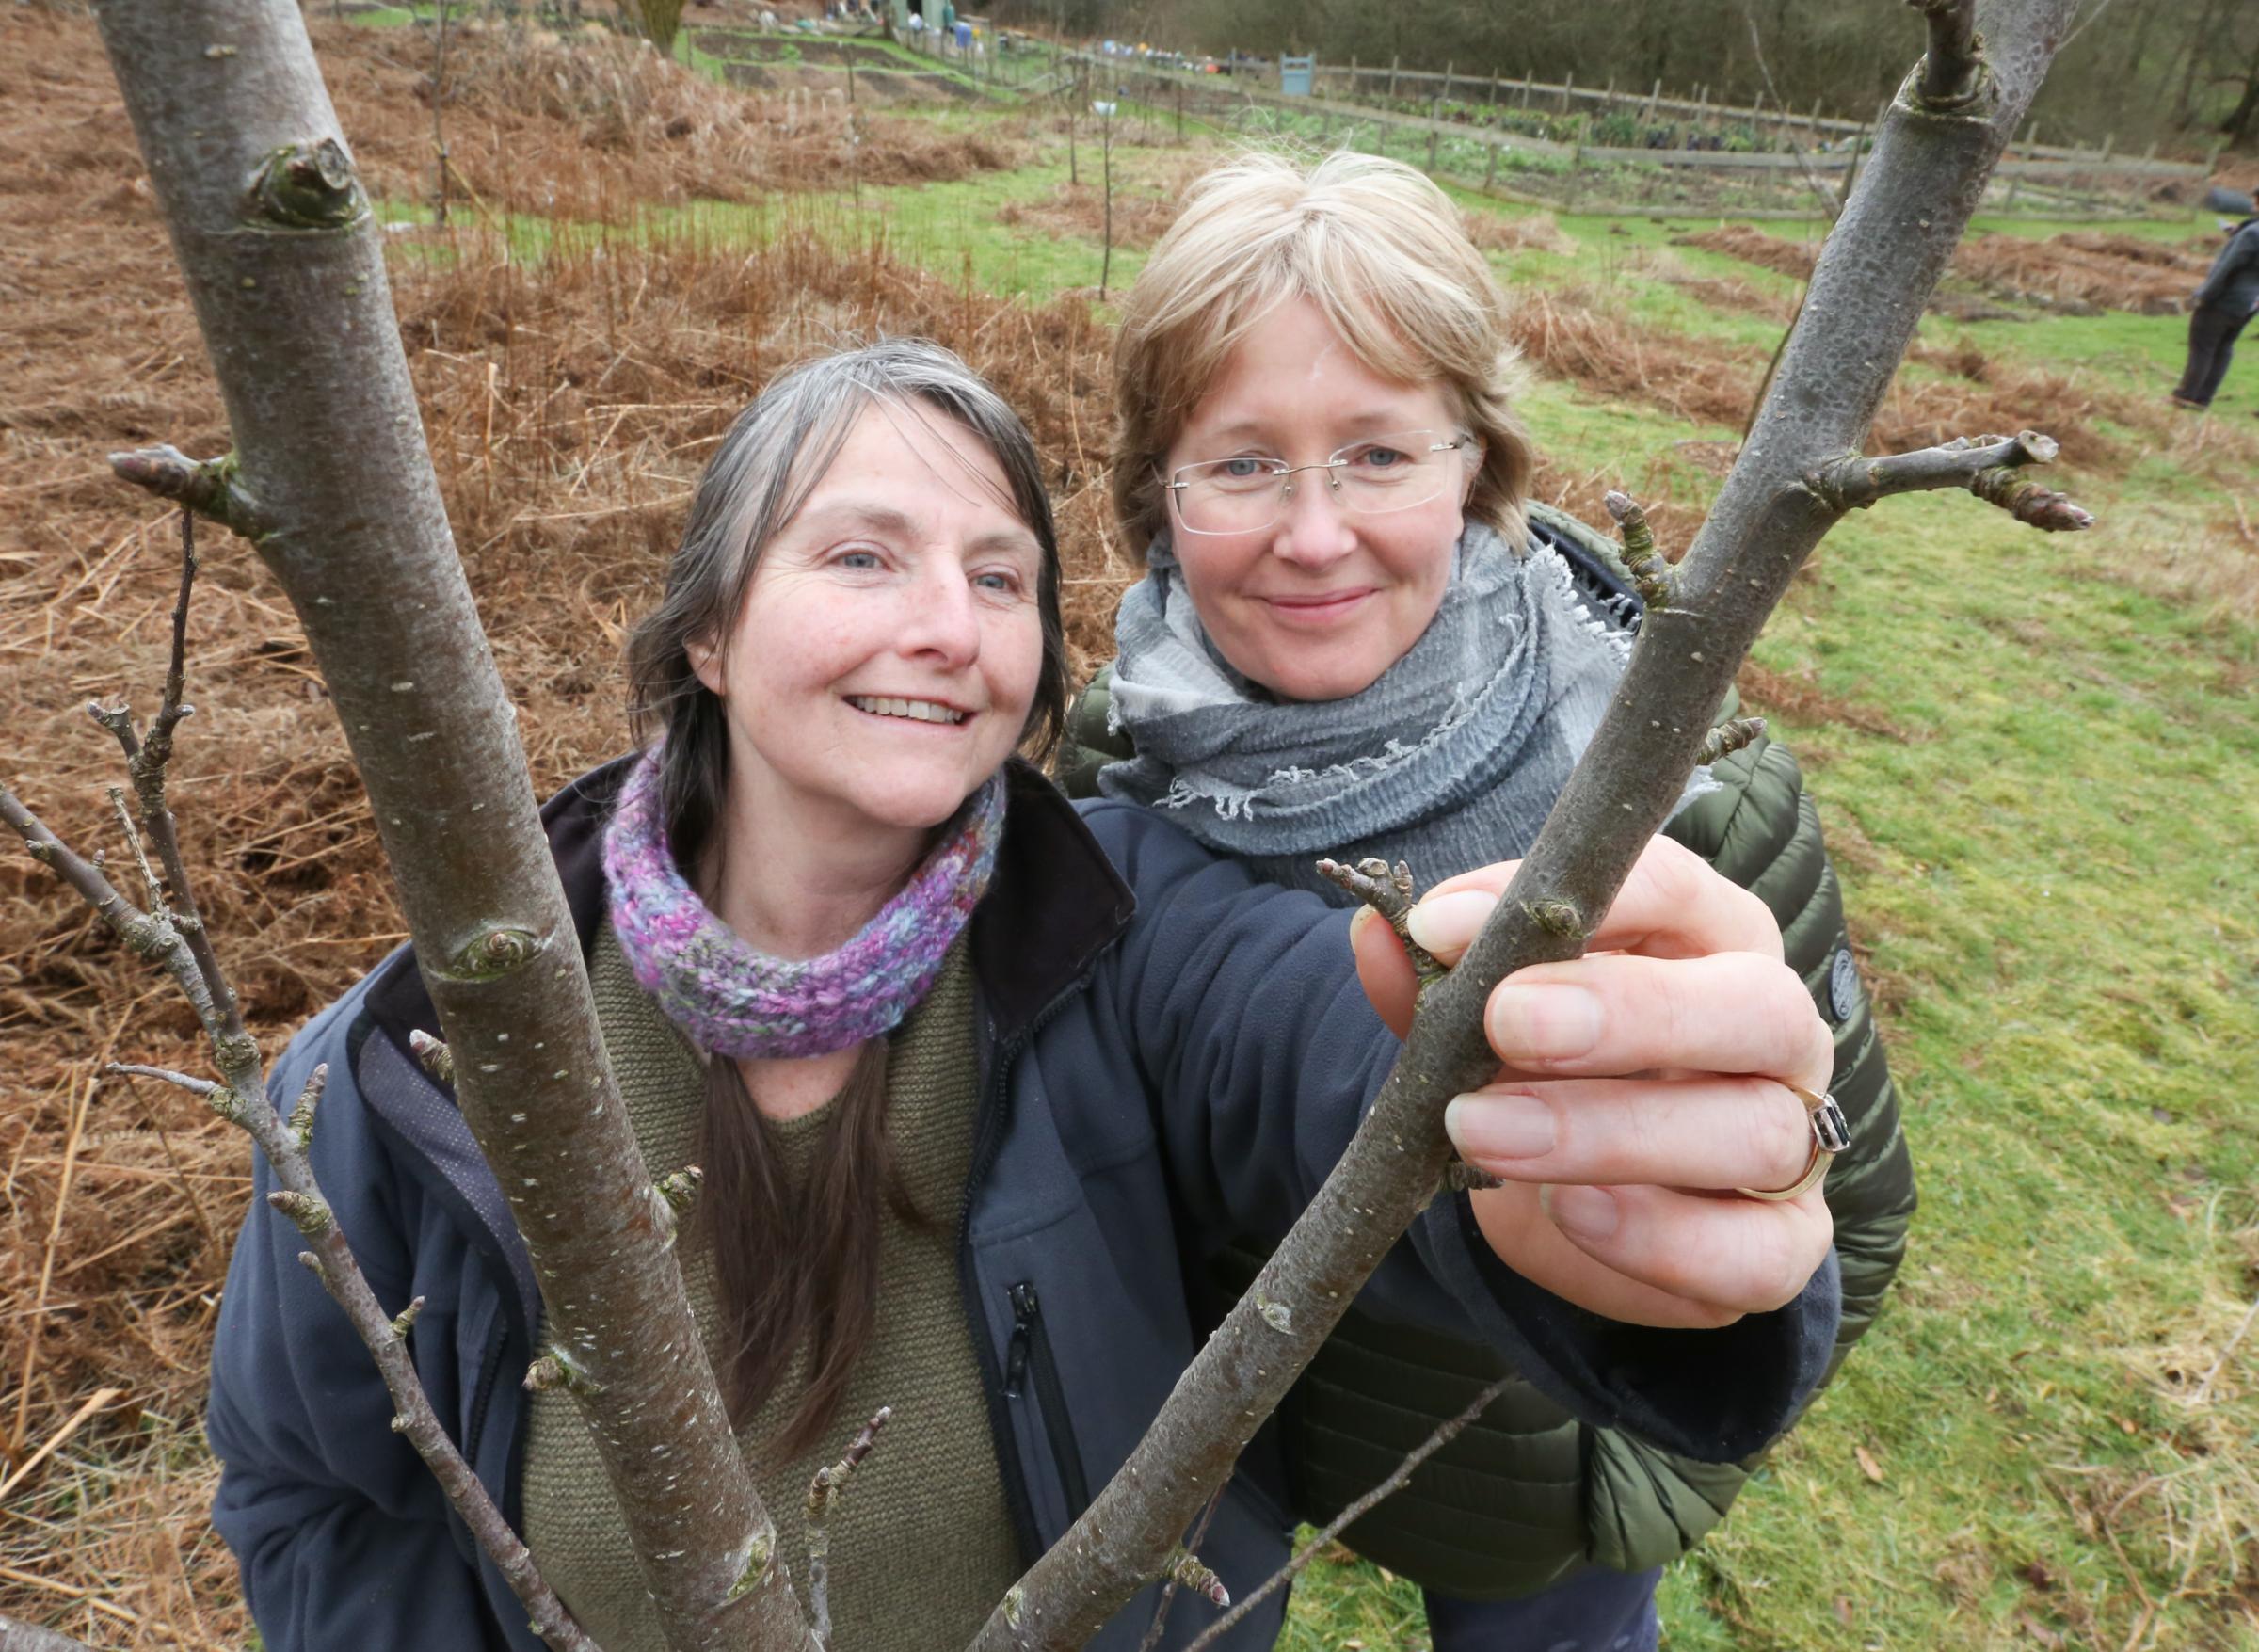 'A little piece of heaven' - go behind the scenes at Flintshire's community garden project